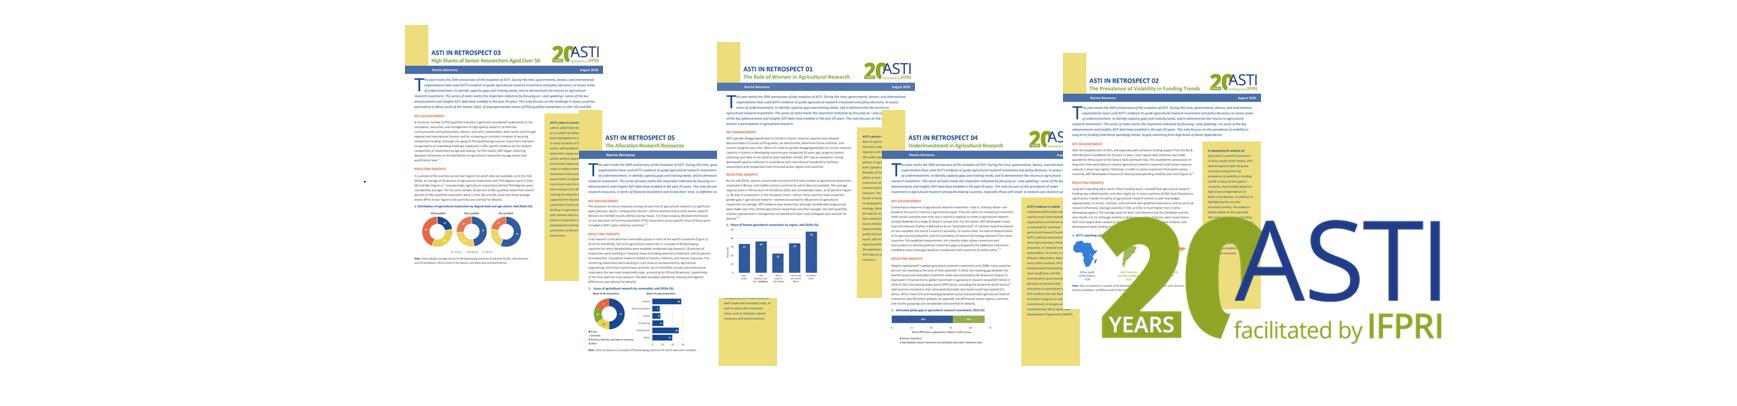 ASTI in retrospect: New series of ASTI program notes